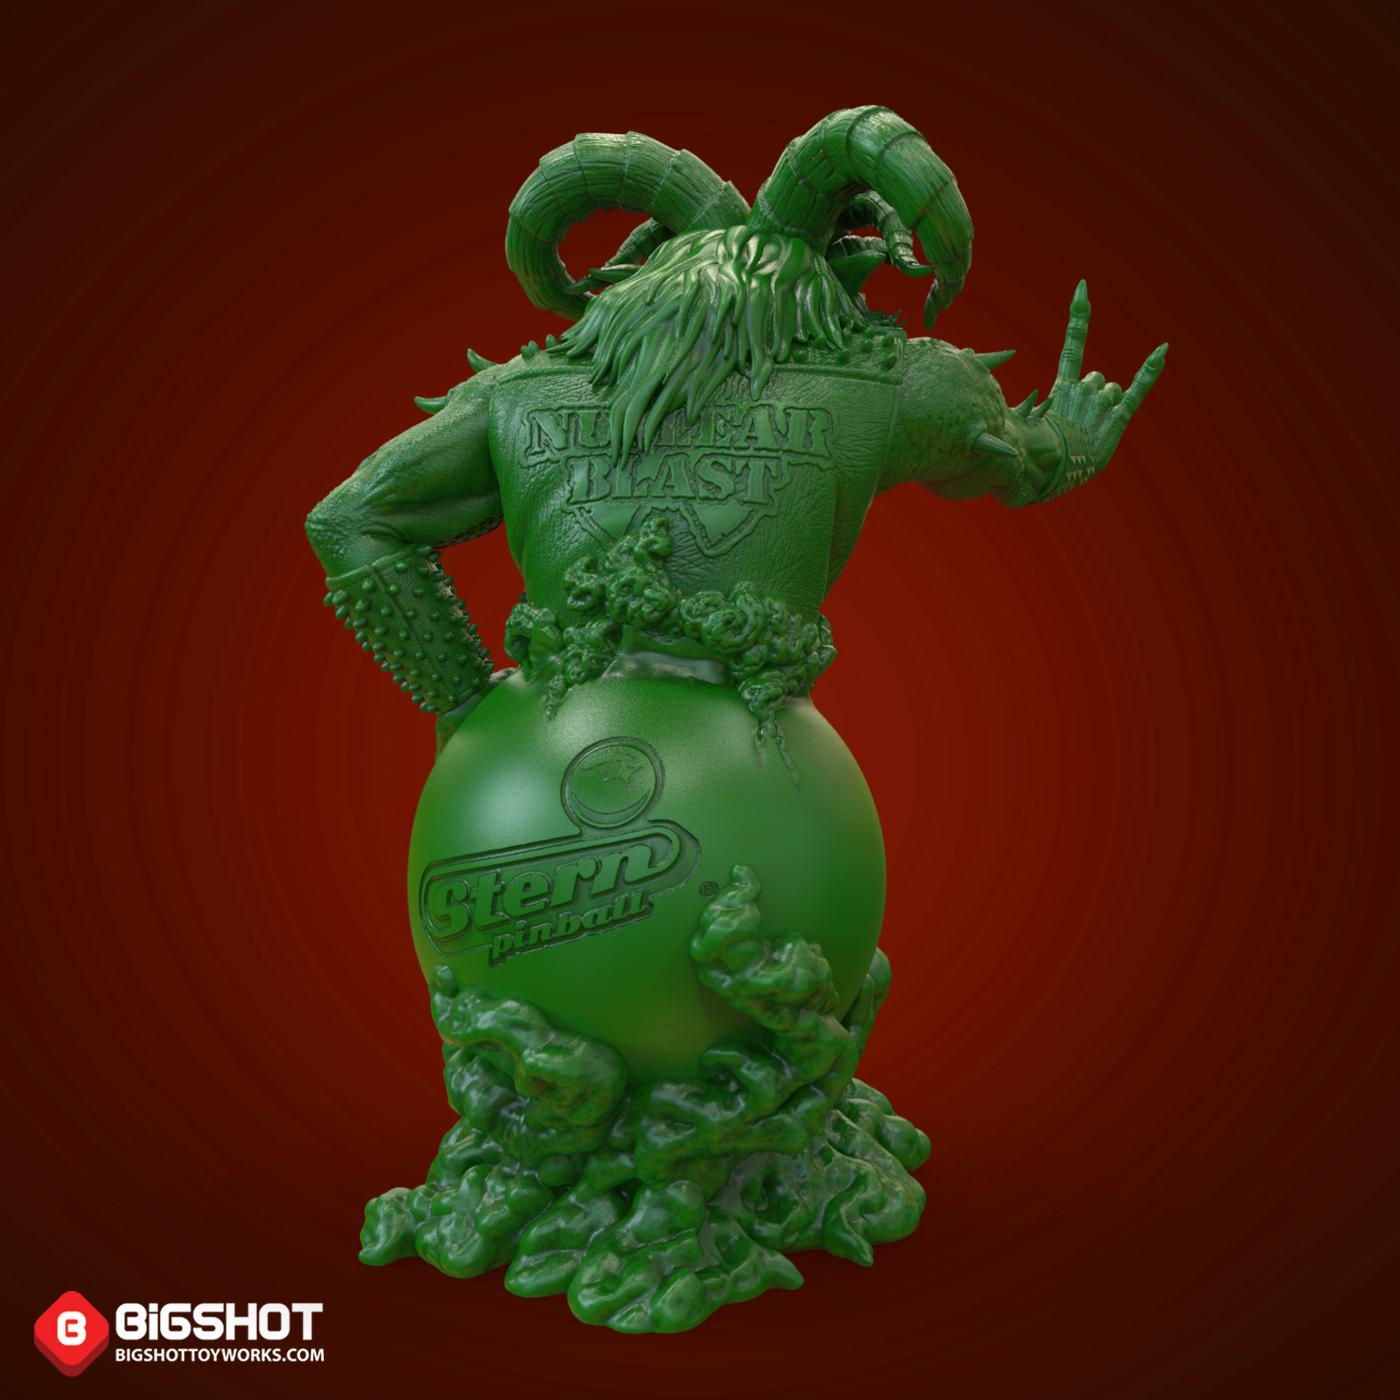 blast_beast-green-back.jpg